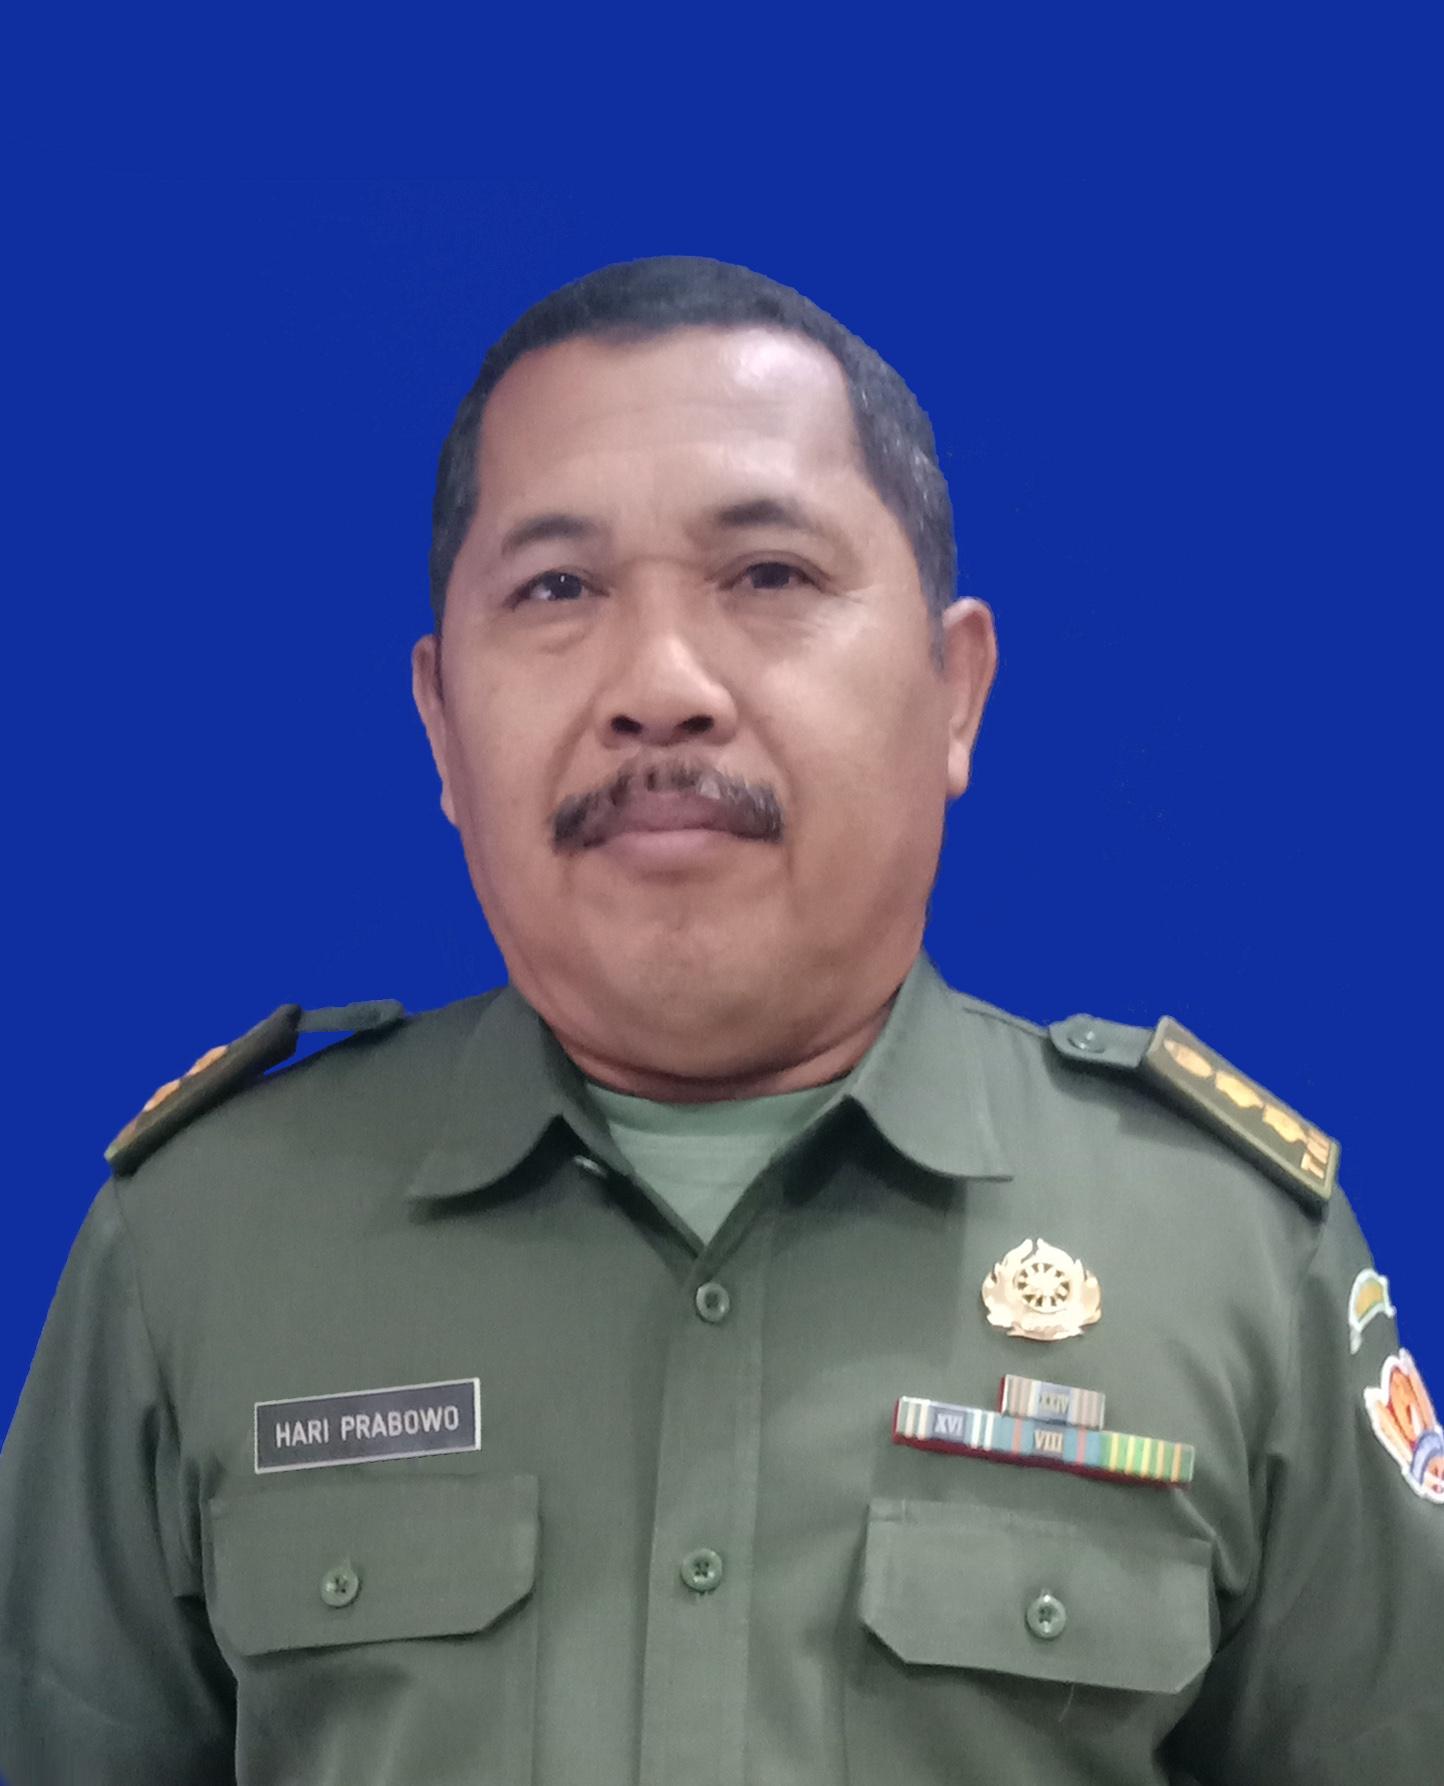 Hari Prabowo, B. Sc.